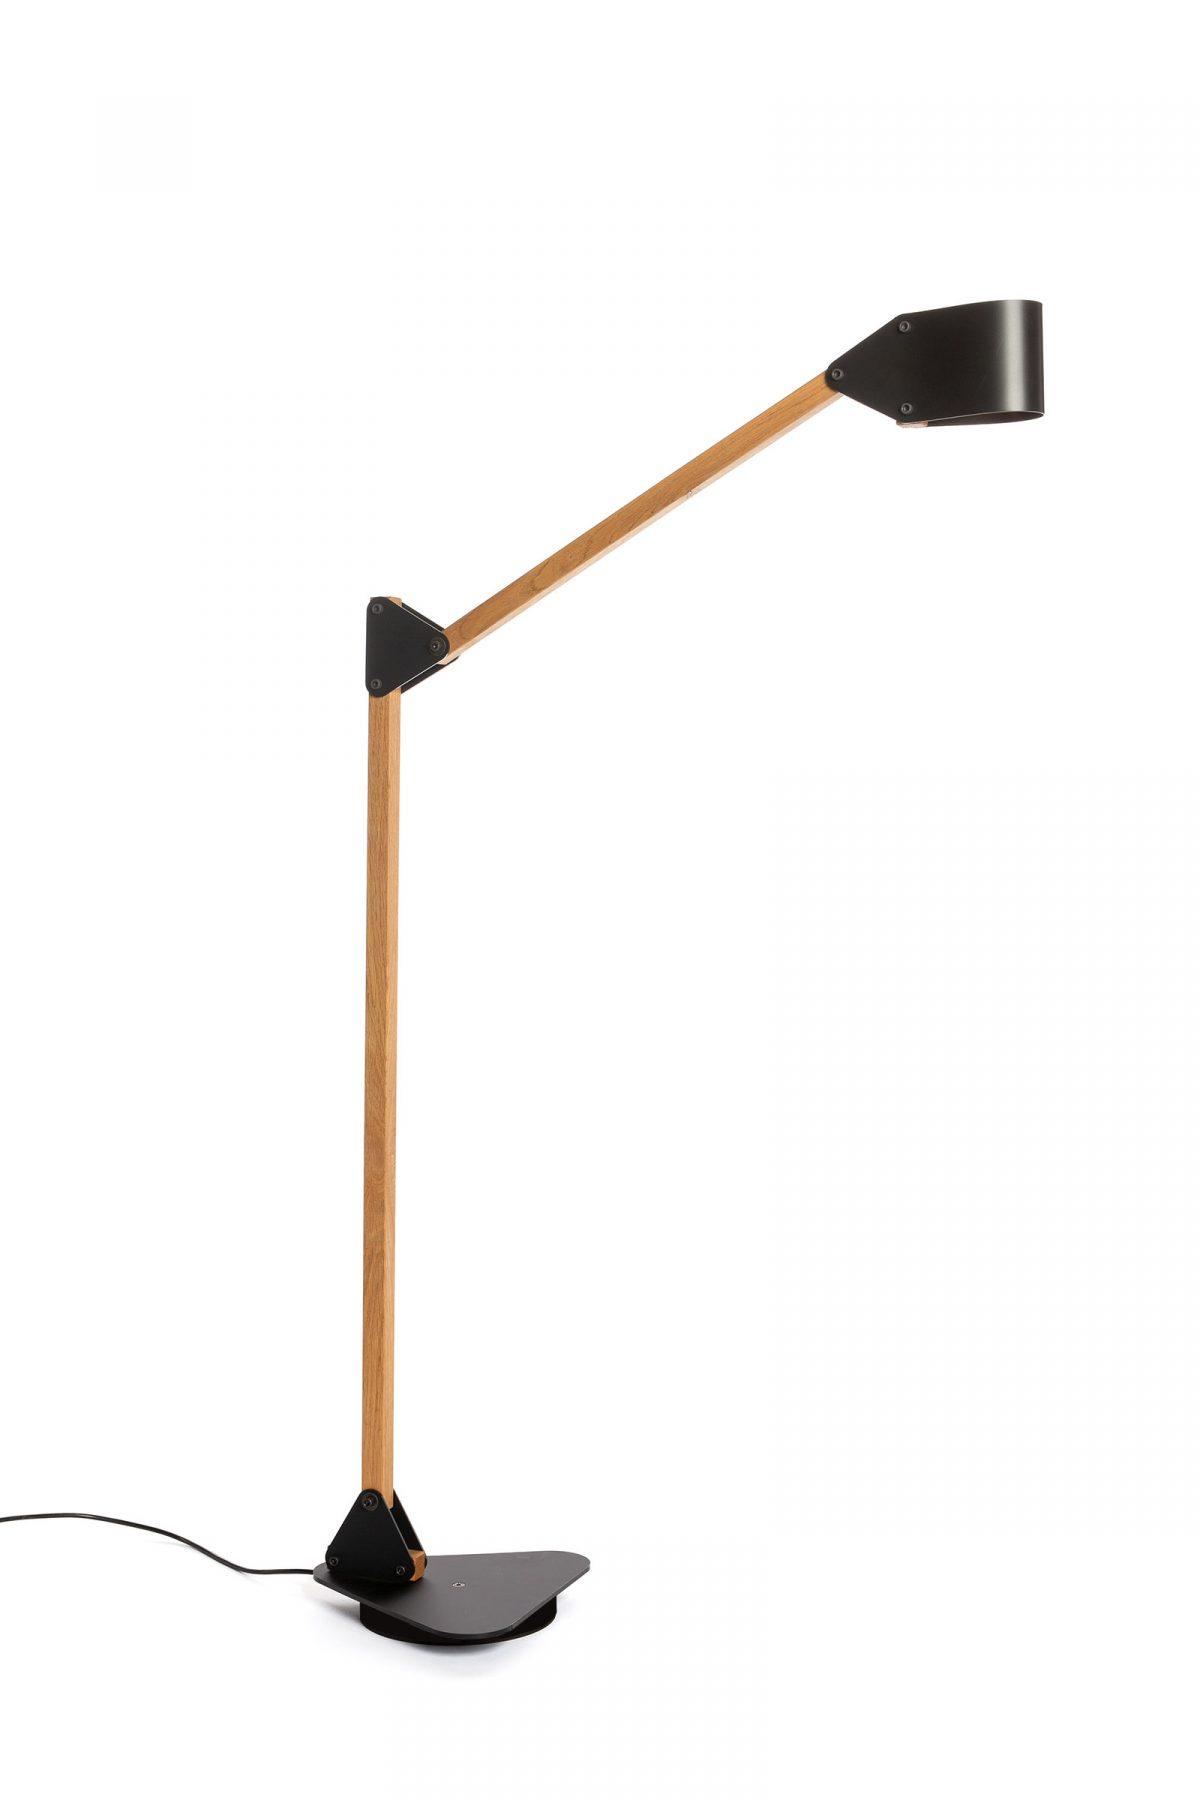 24mm Triangle floor lamp double